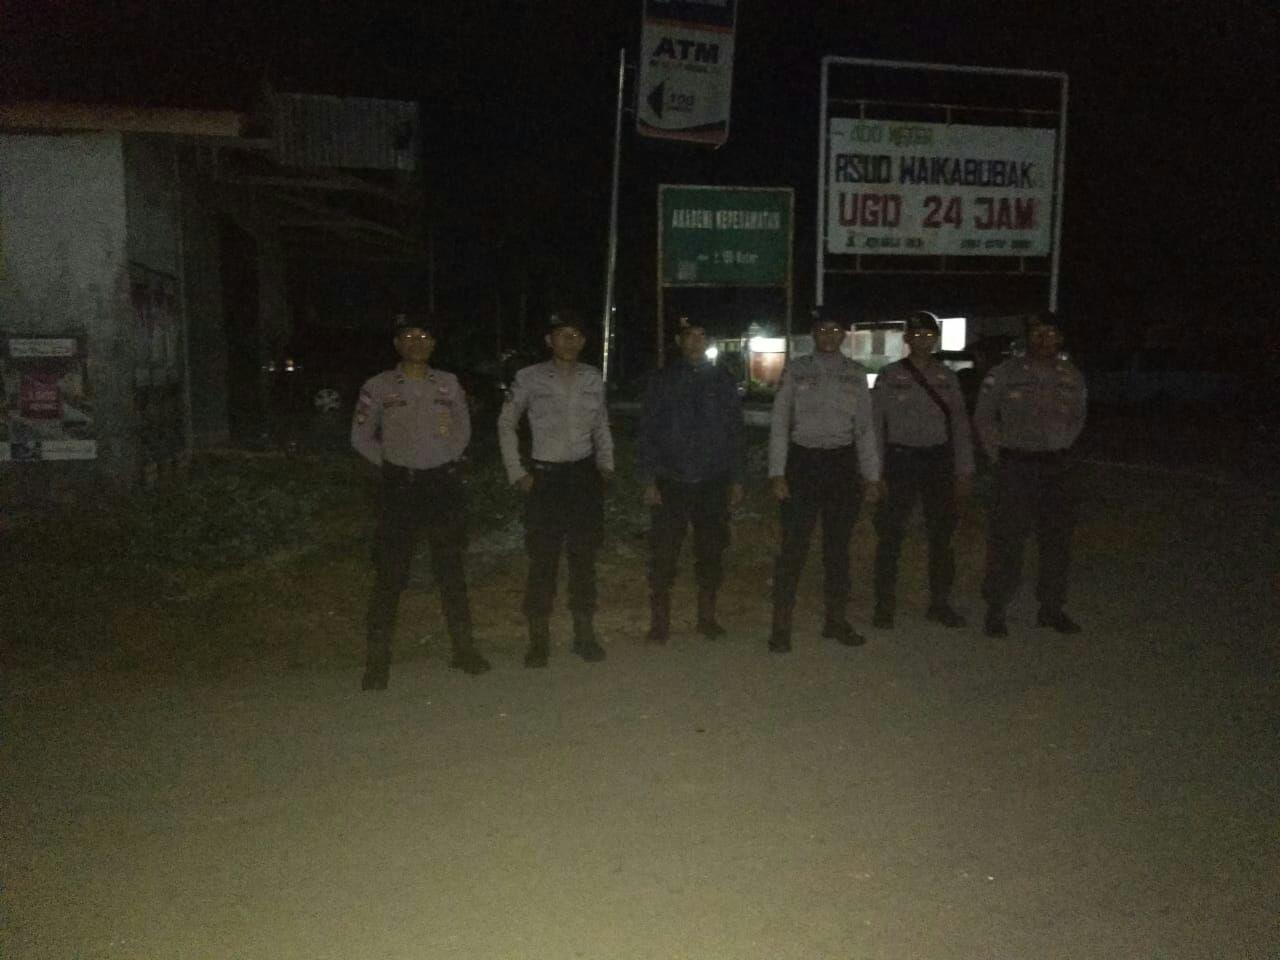 Upaya Memberikan Keamanan dan Kenyamanan Masyarakat, Patroli Malam Terus Dilakukan